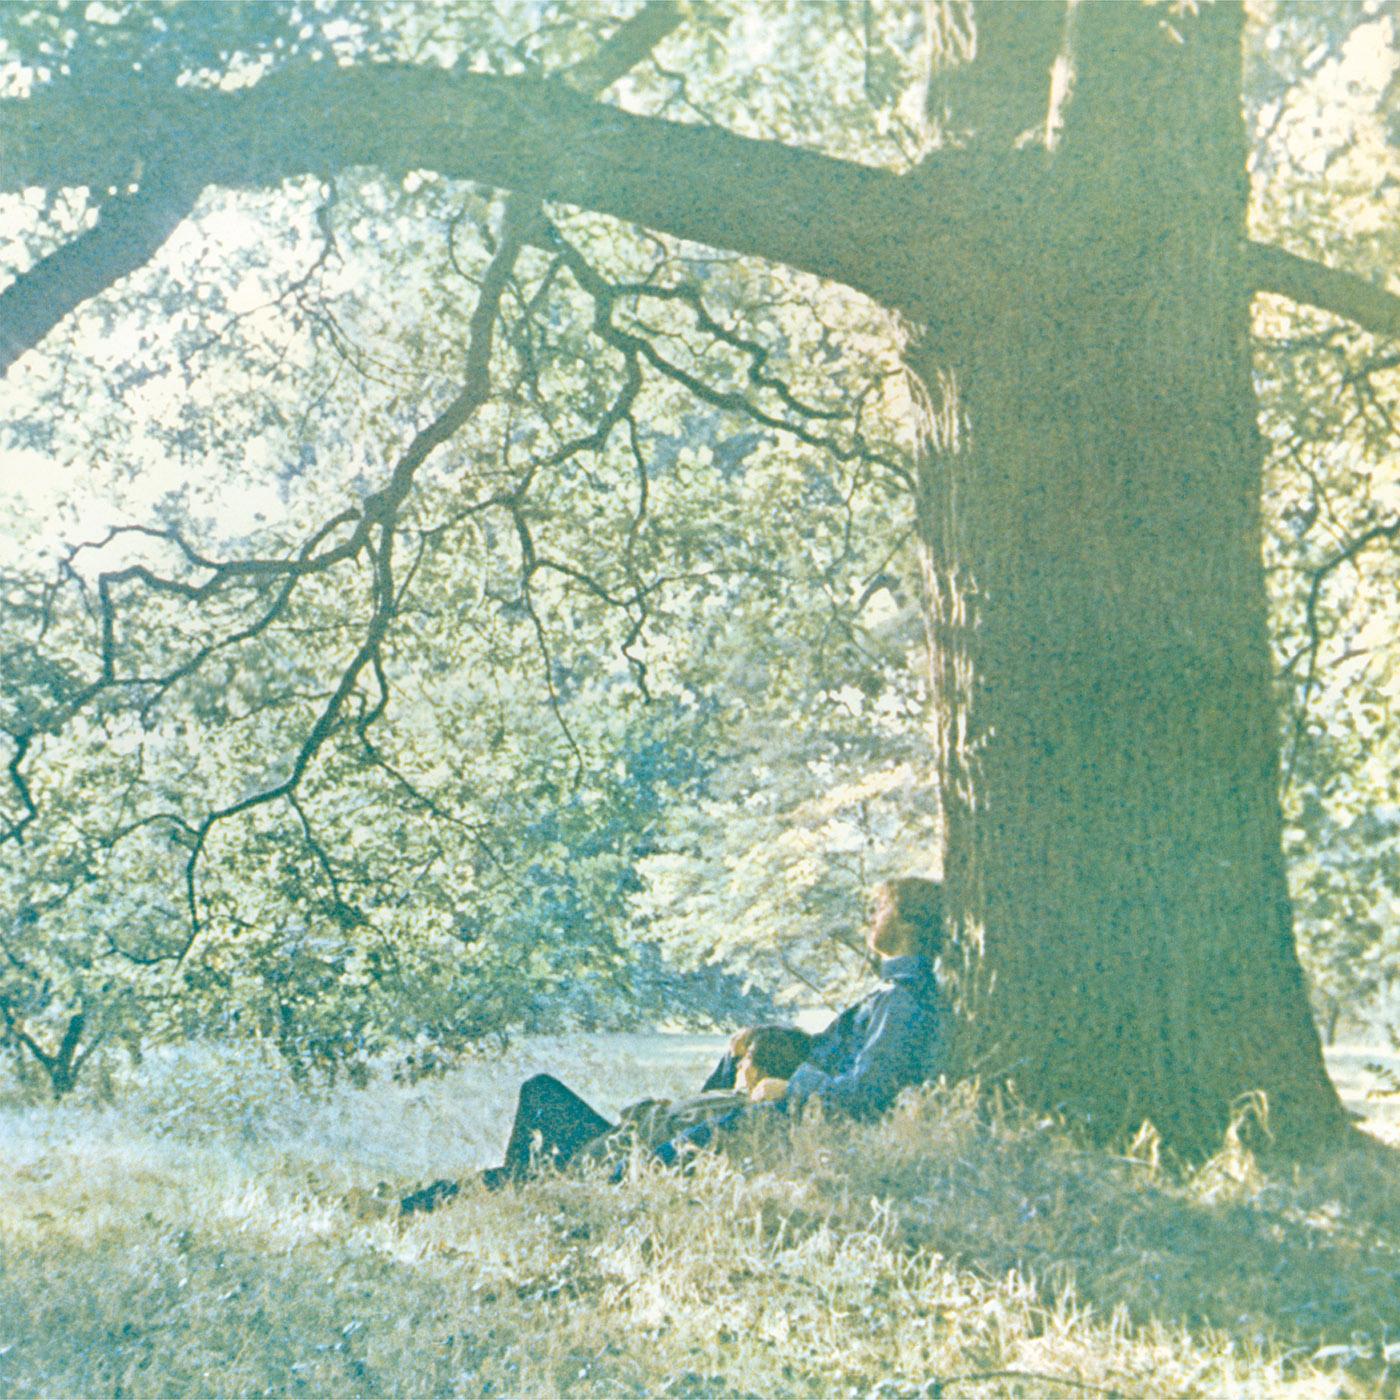 Lennon Ono Wedding Album Reissue   Beatles Blog